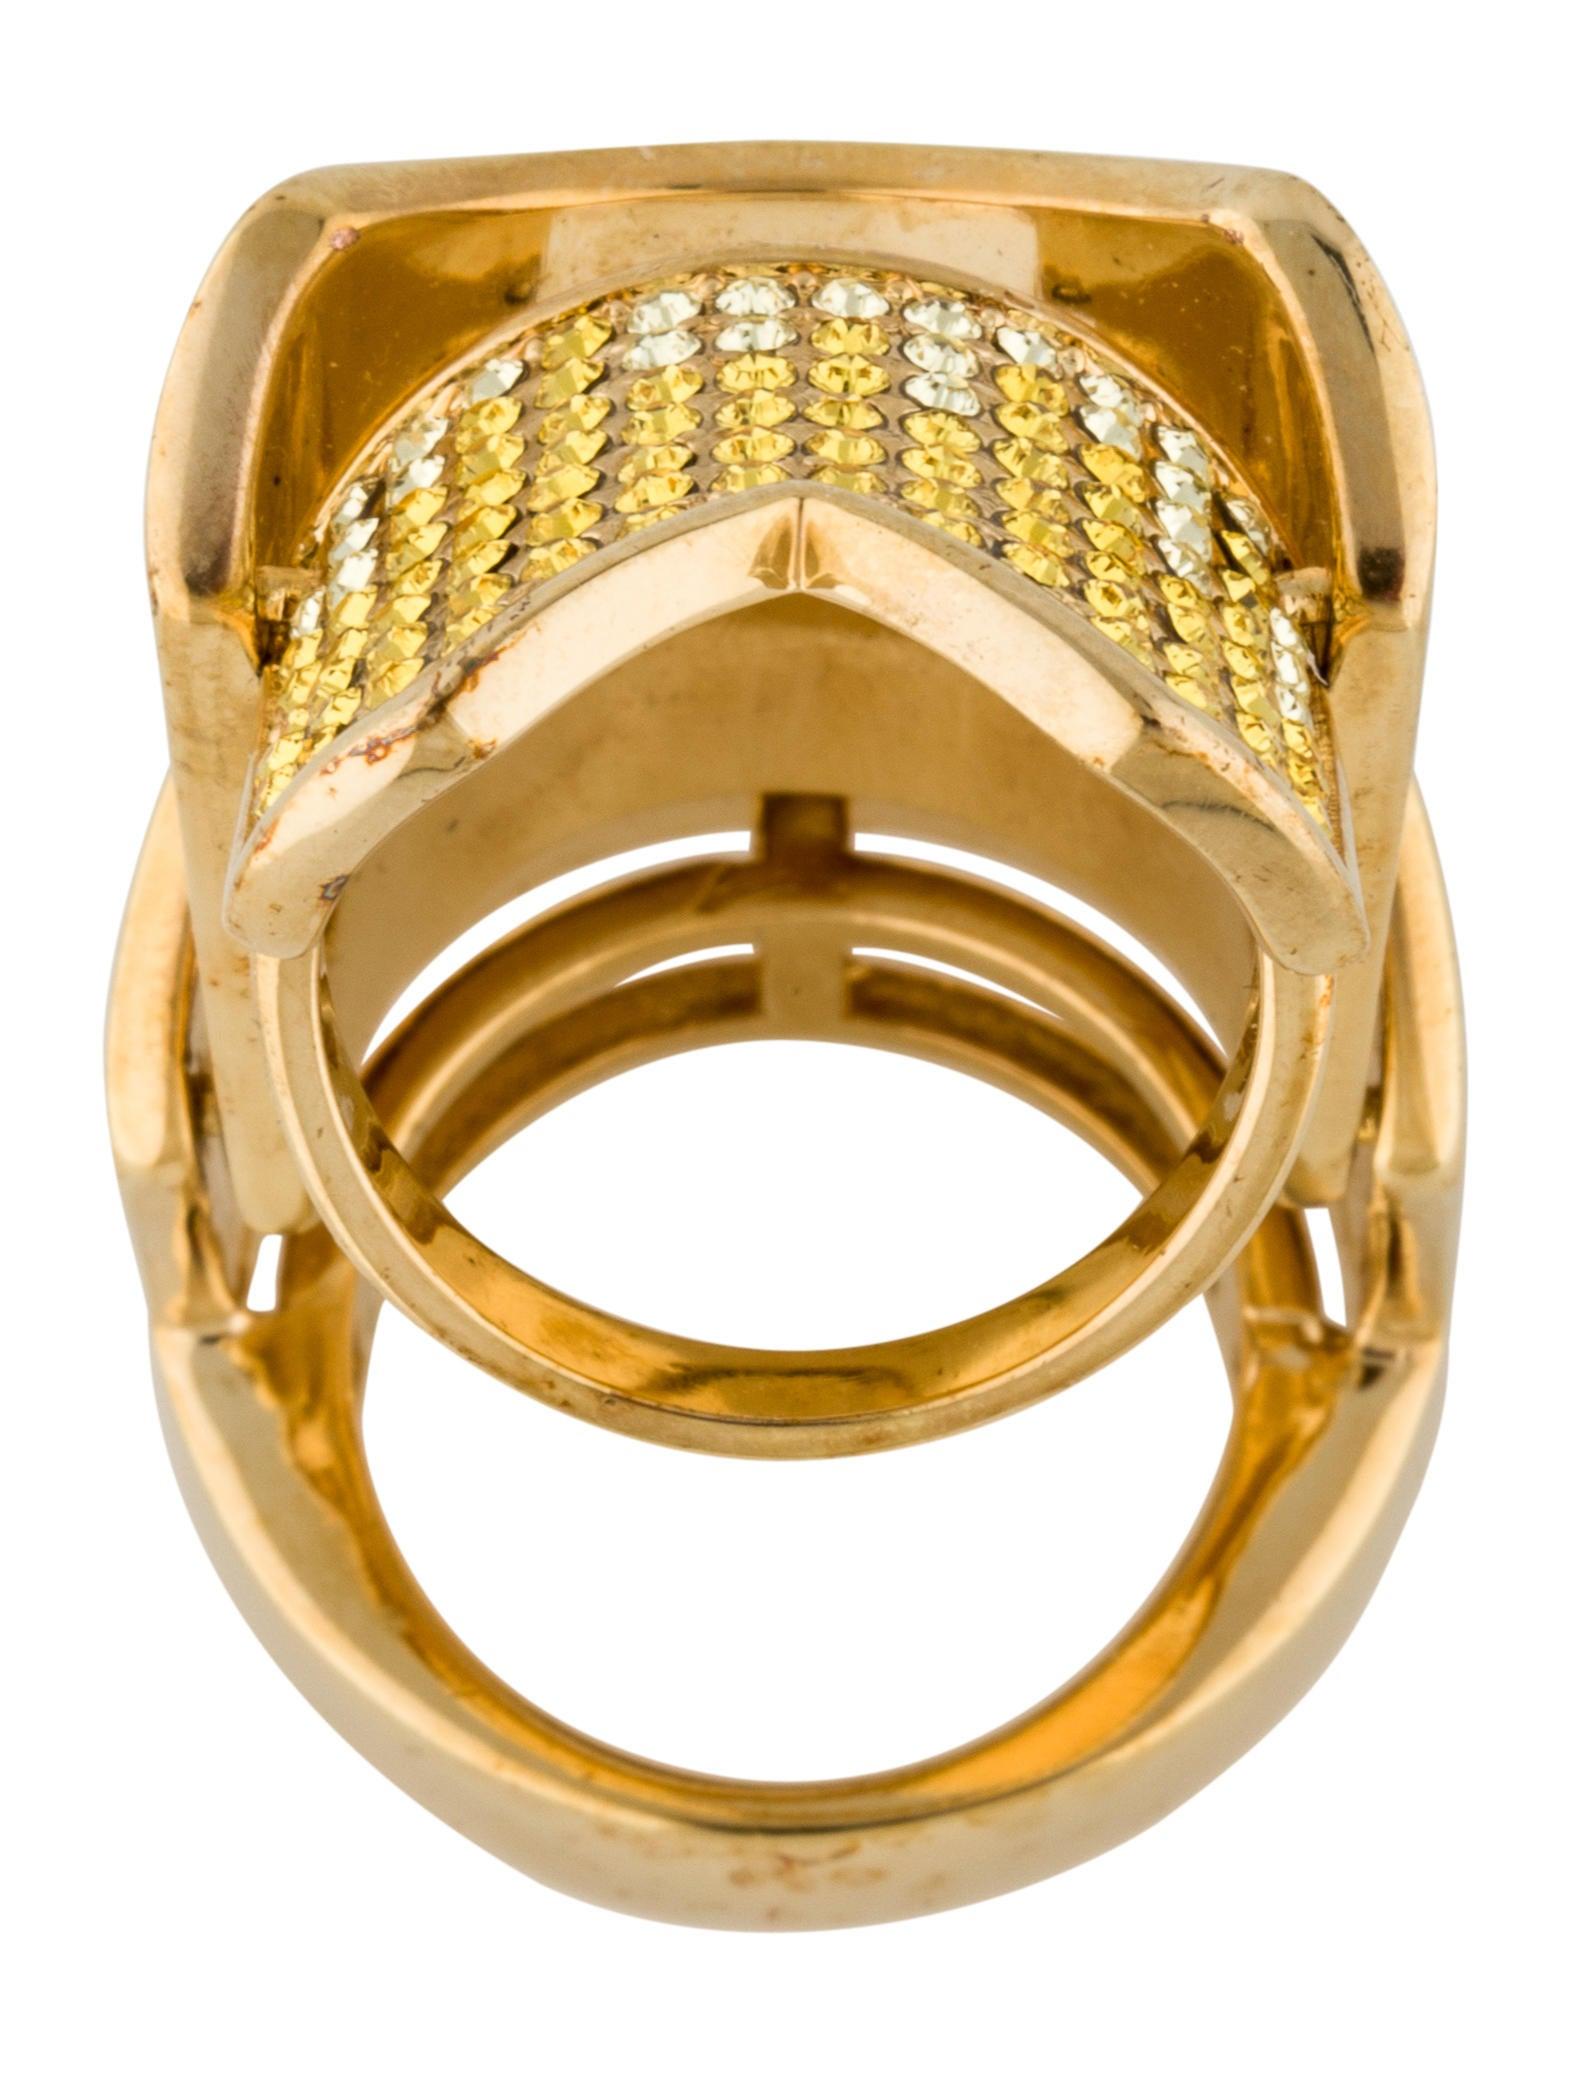 eddie borgo hinge ring jewelry ebo20986 the